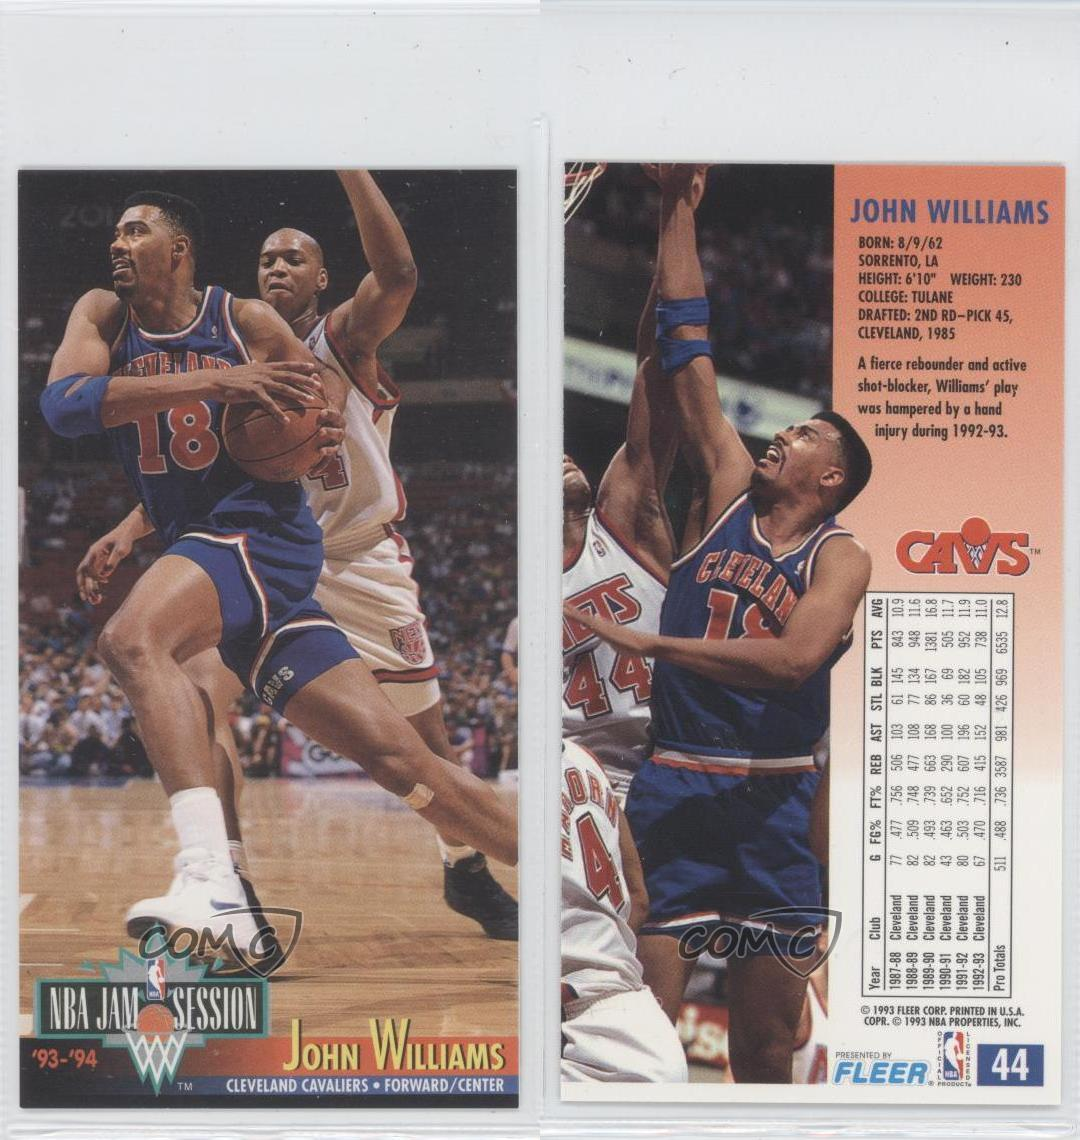 1993-94 NBA Jam Session #44 John Williams Cleveland